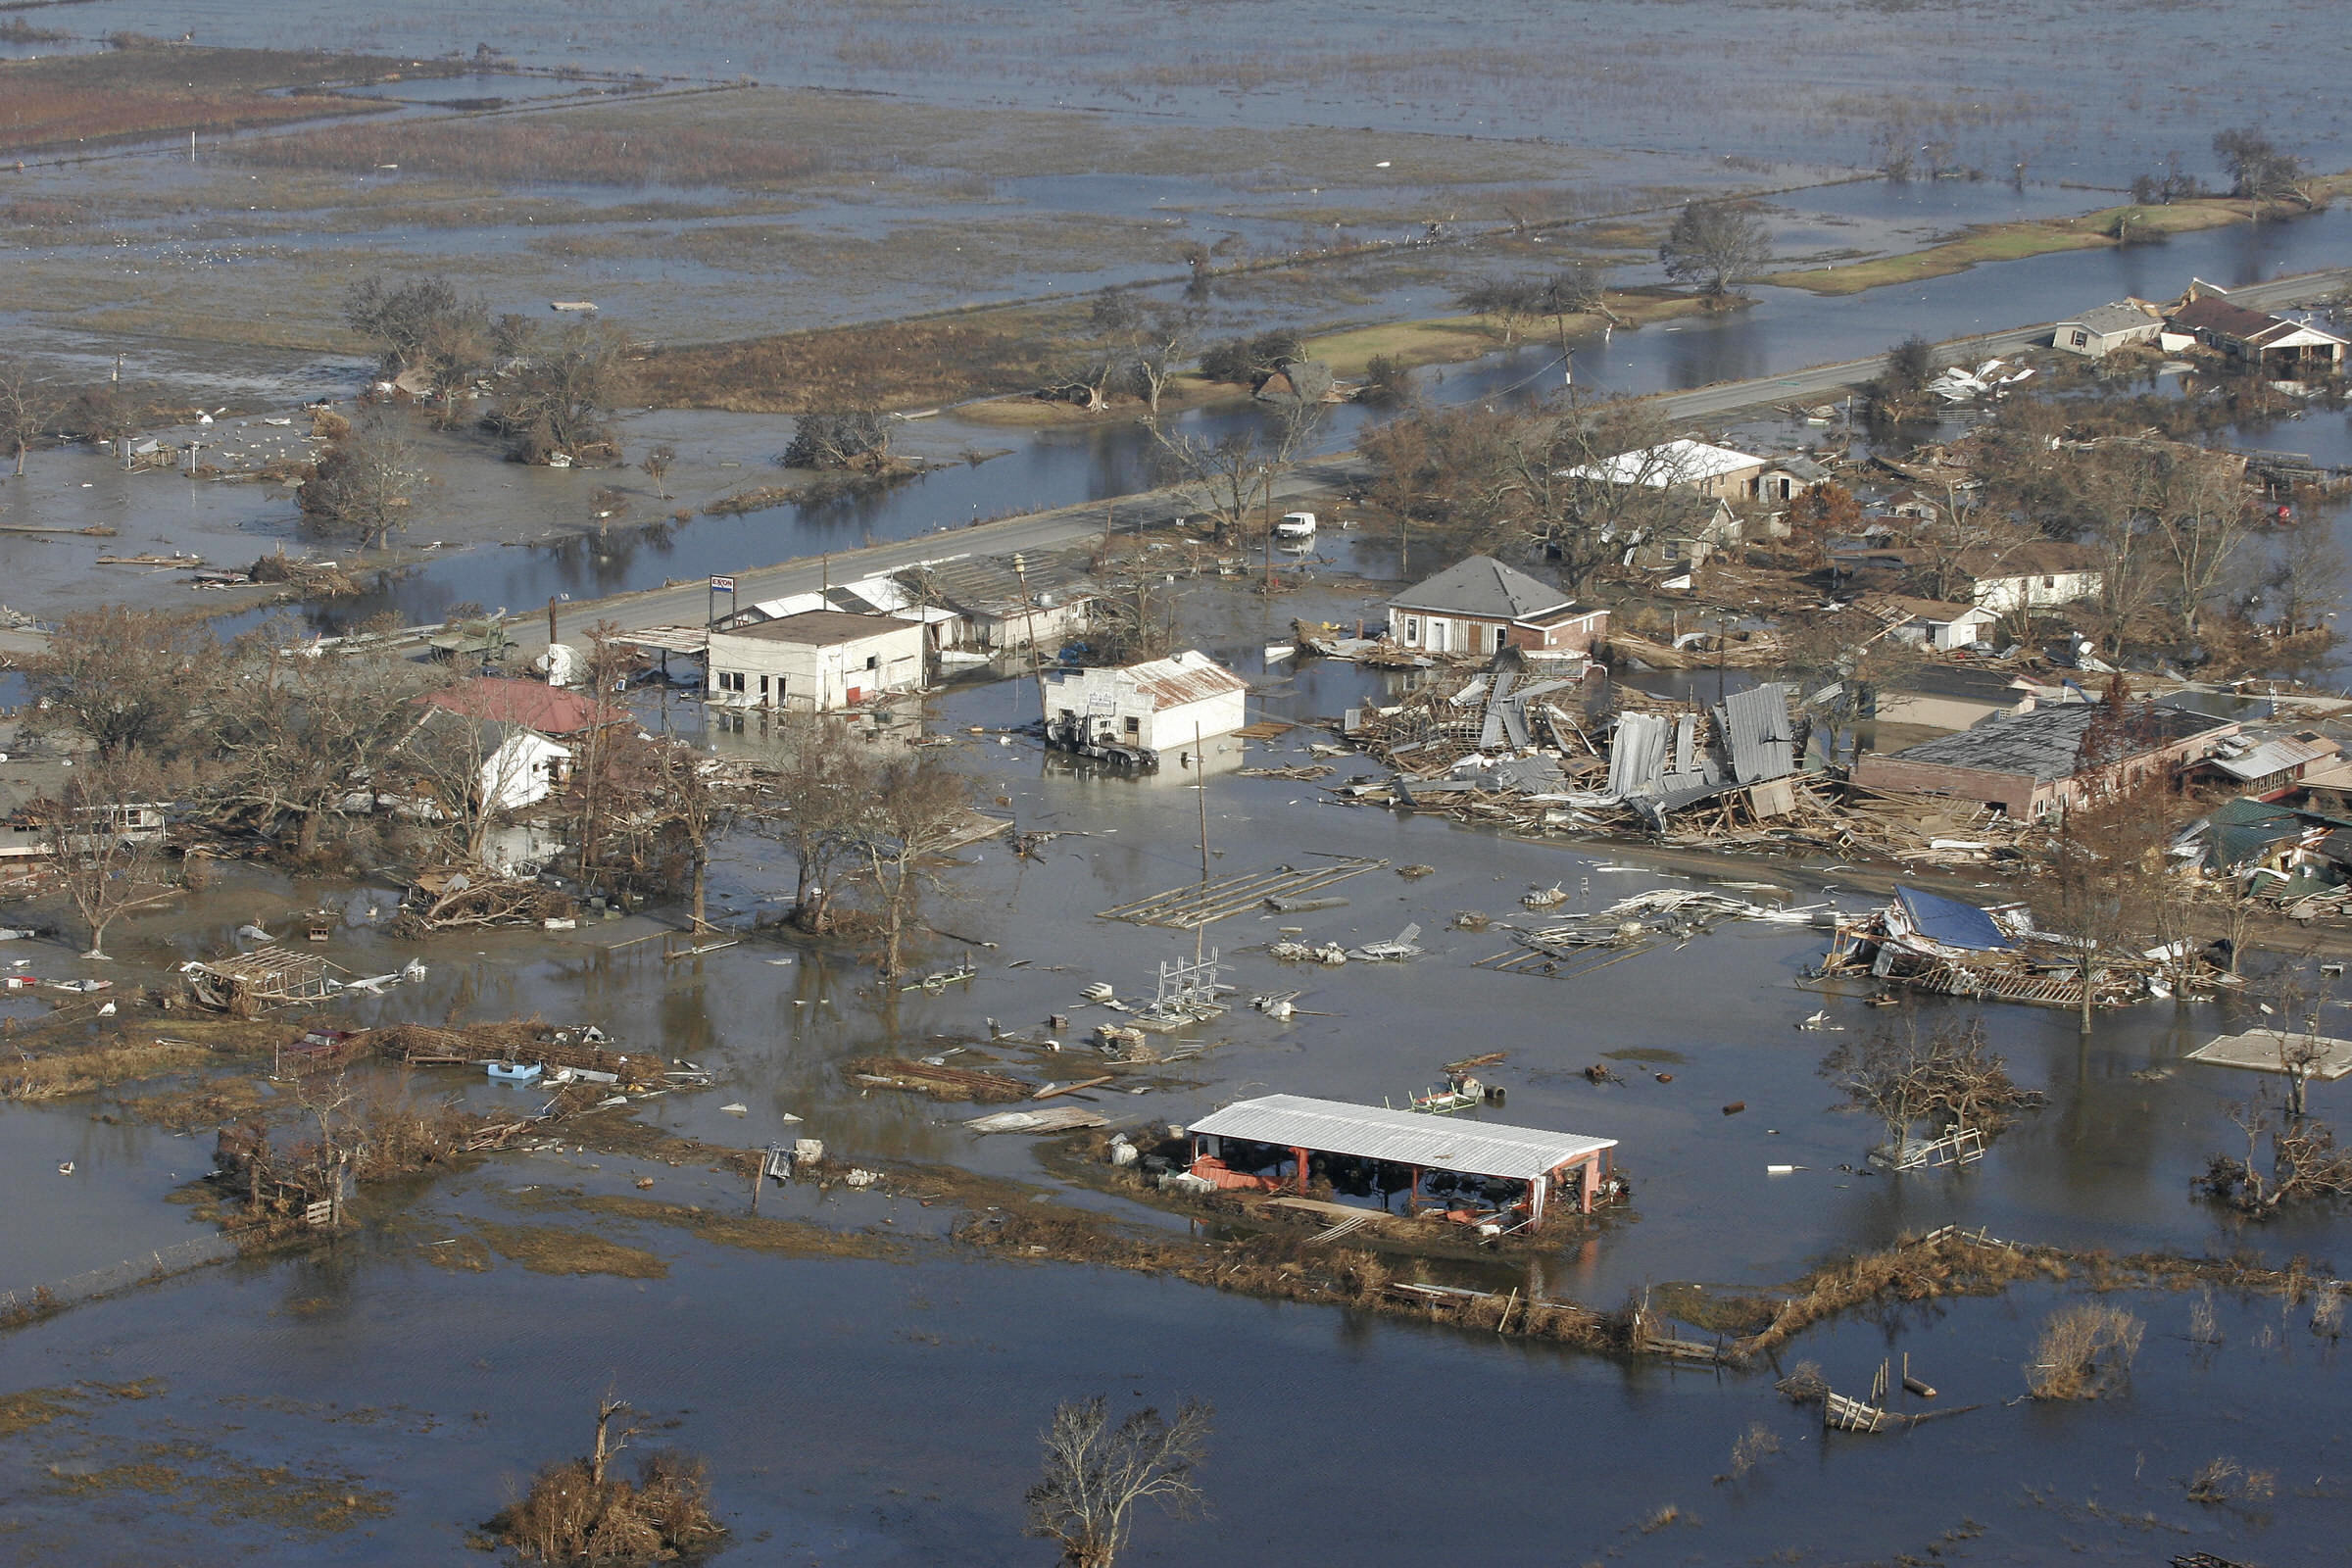 Huracán Rita Louisiana 2005